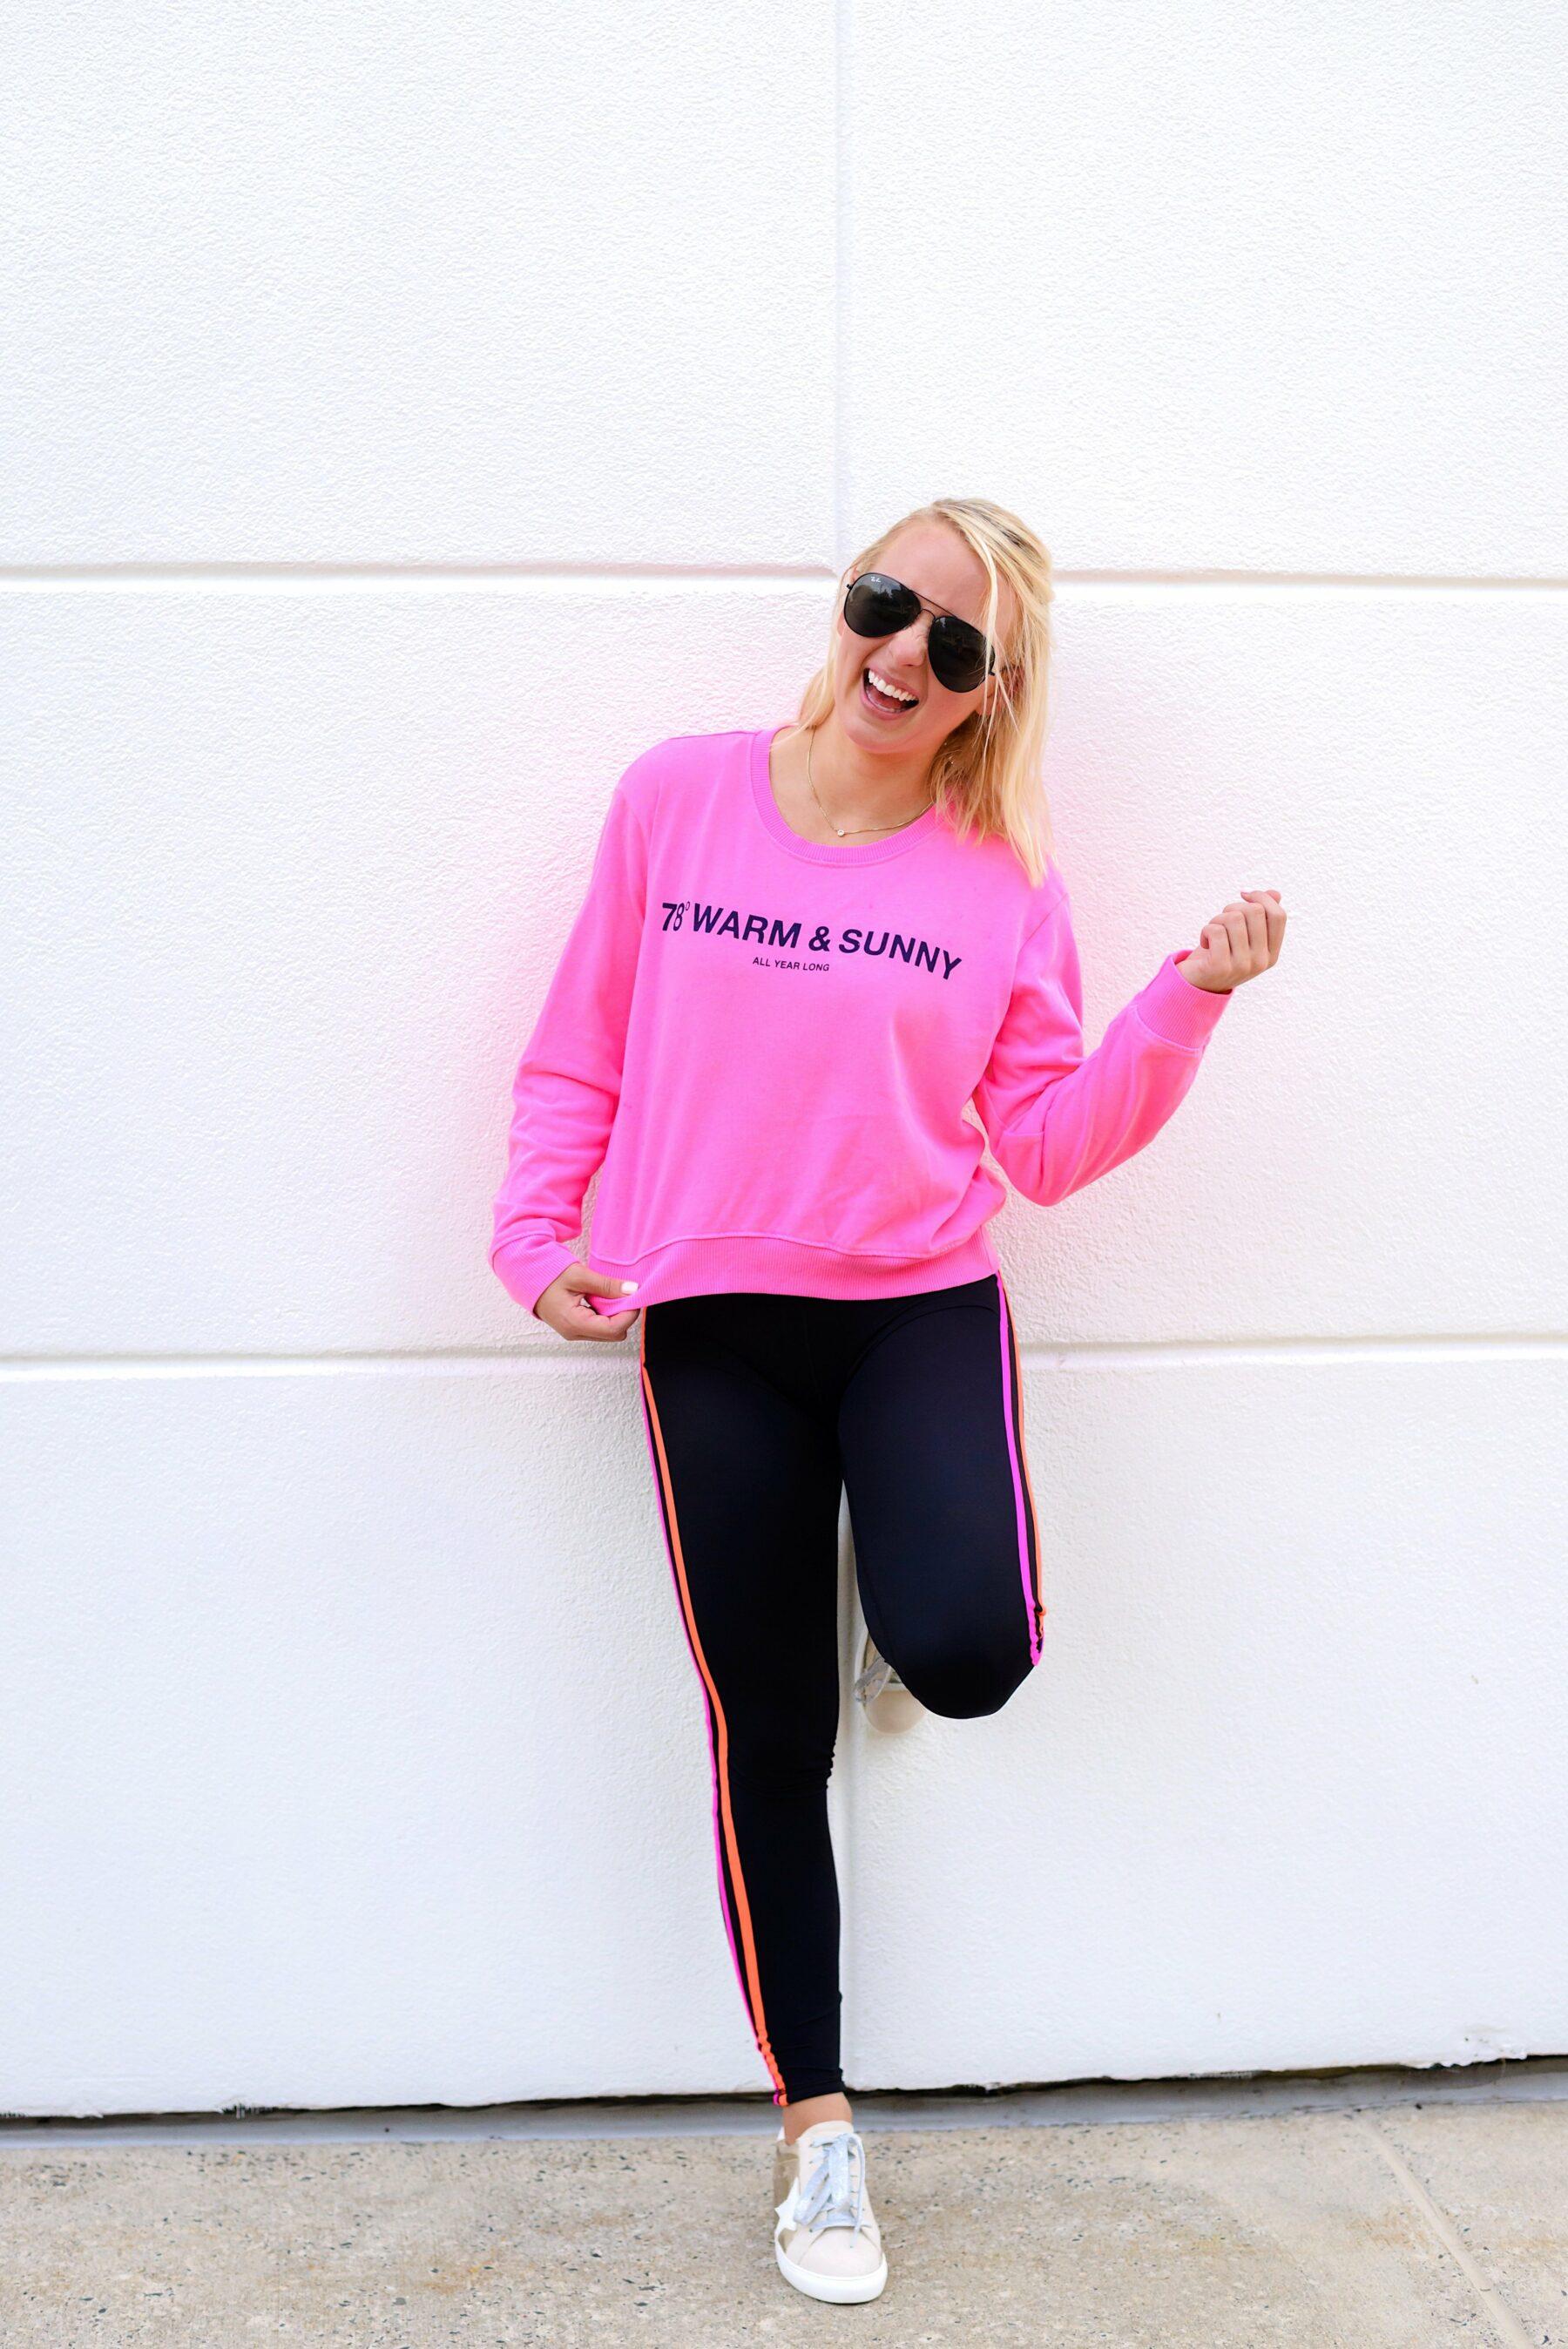 Addison Bay fashion forward activewear